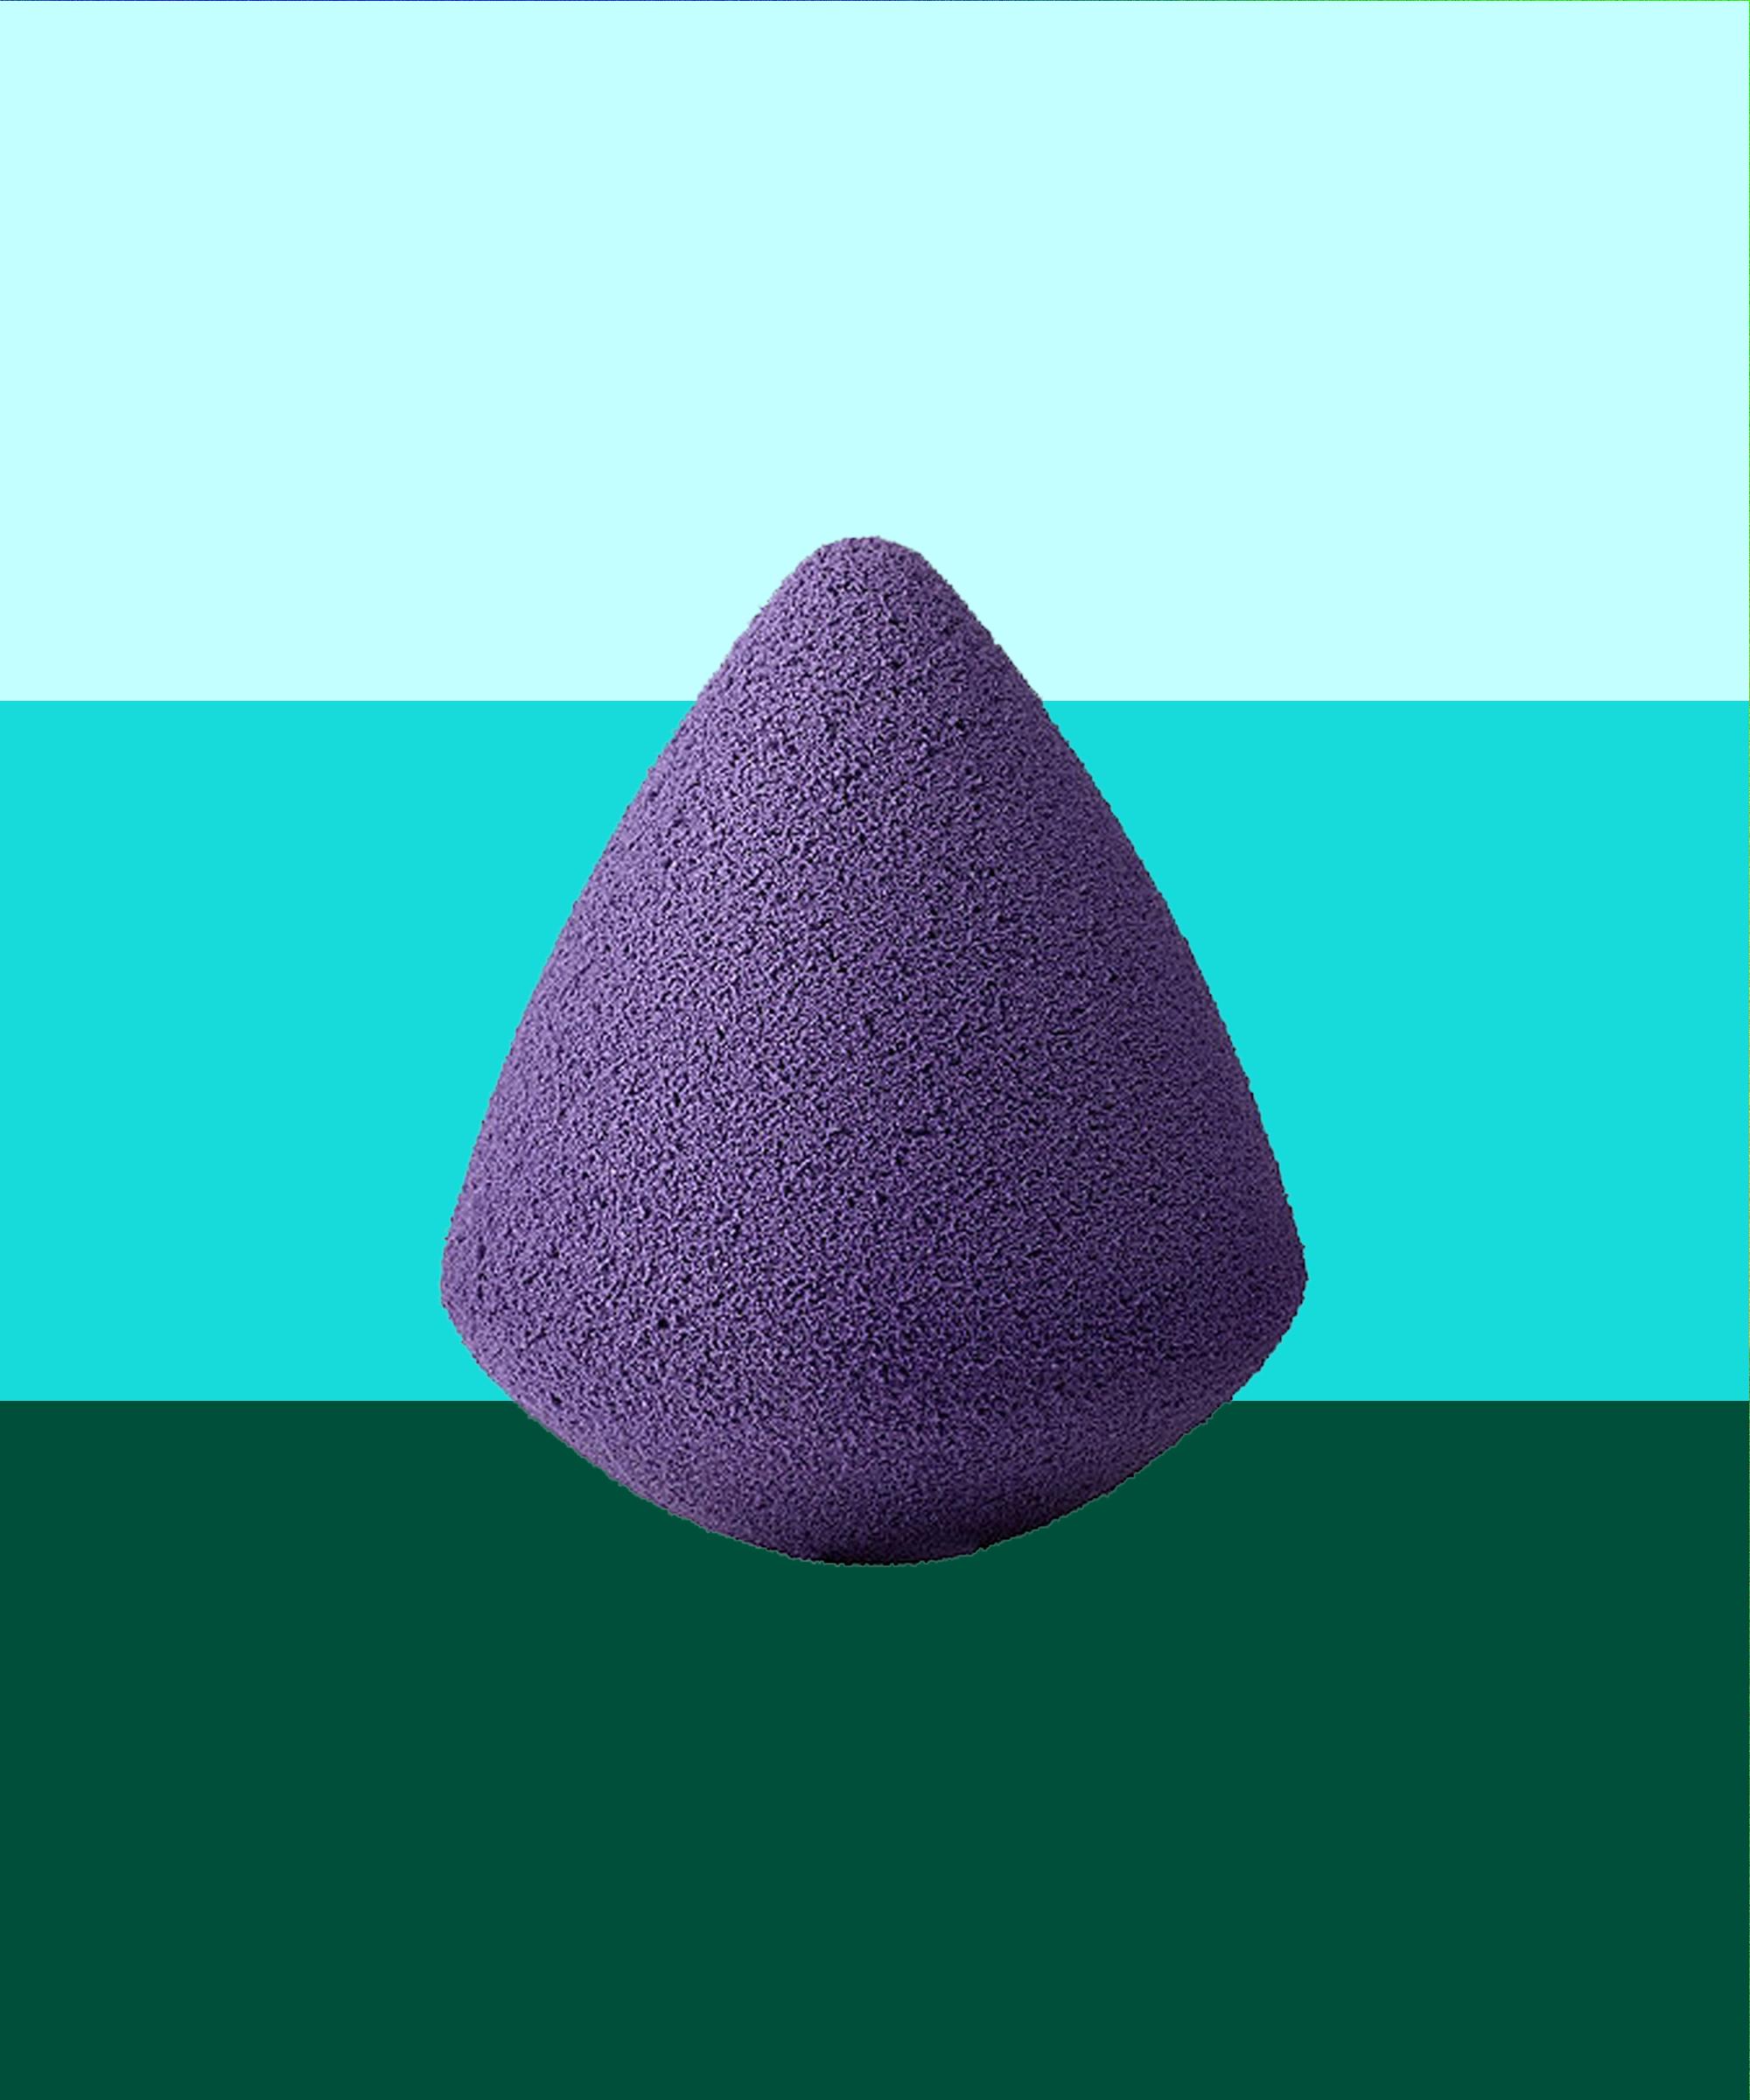 Makeup Sponge Reviews Beauty Blender Alternatives Egg Drop Contouring